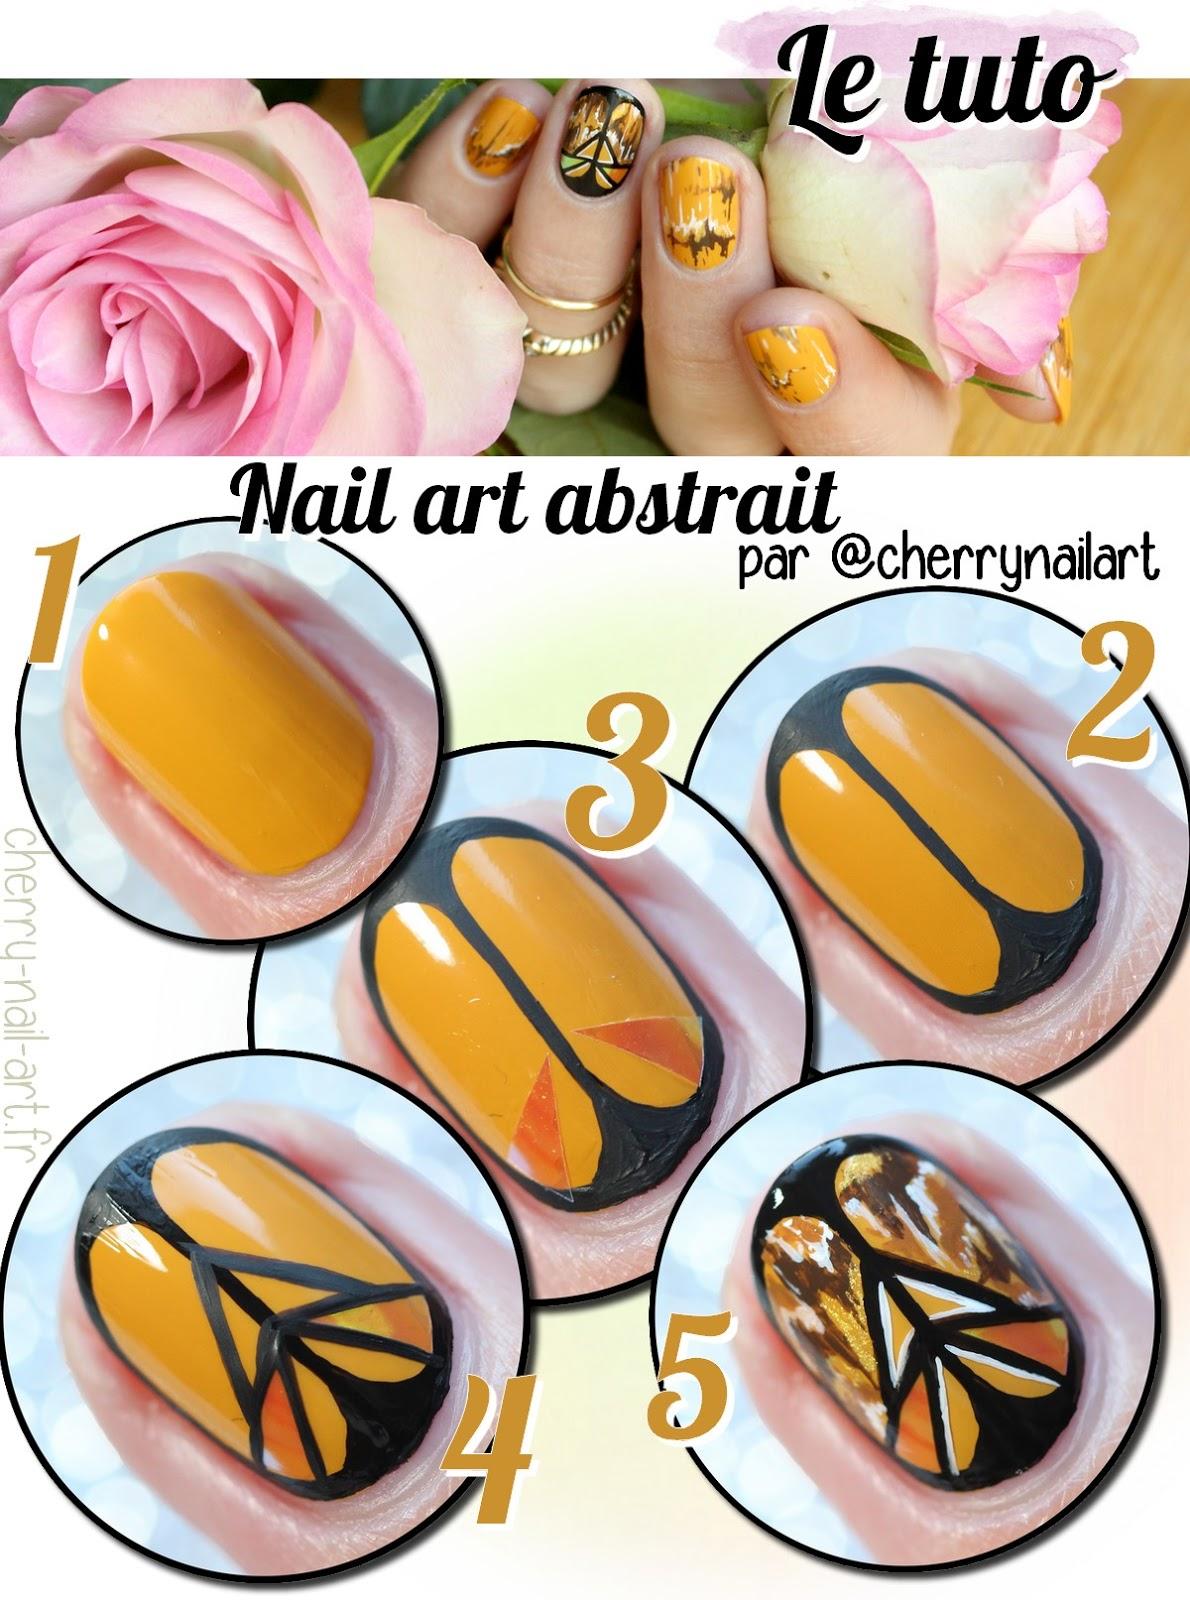 tuto-nail-art-ethnique-glass-nail-automne